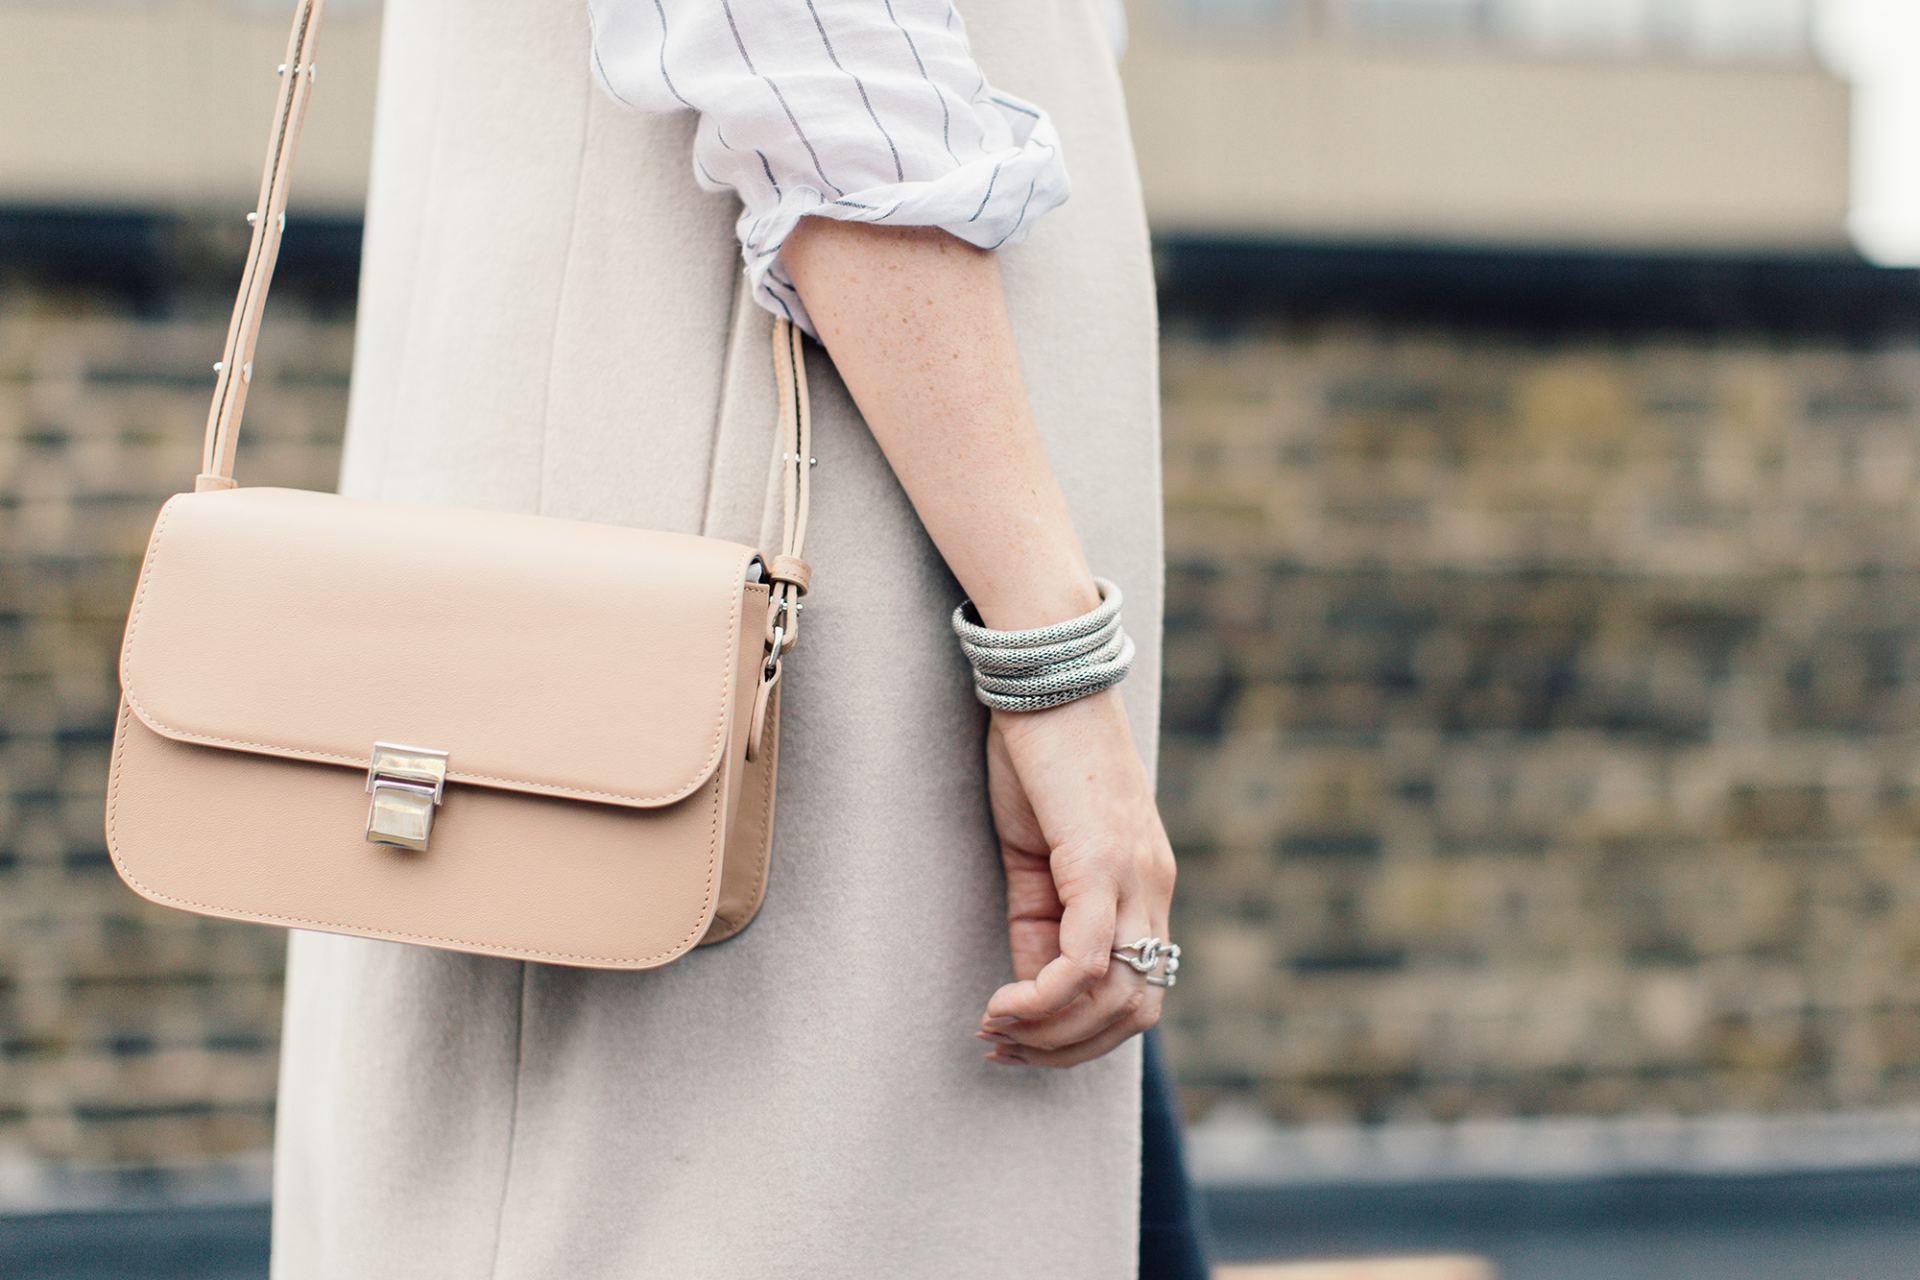 olympus-pen-accessory-bag